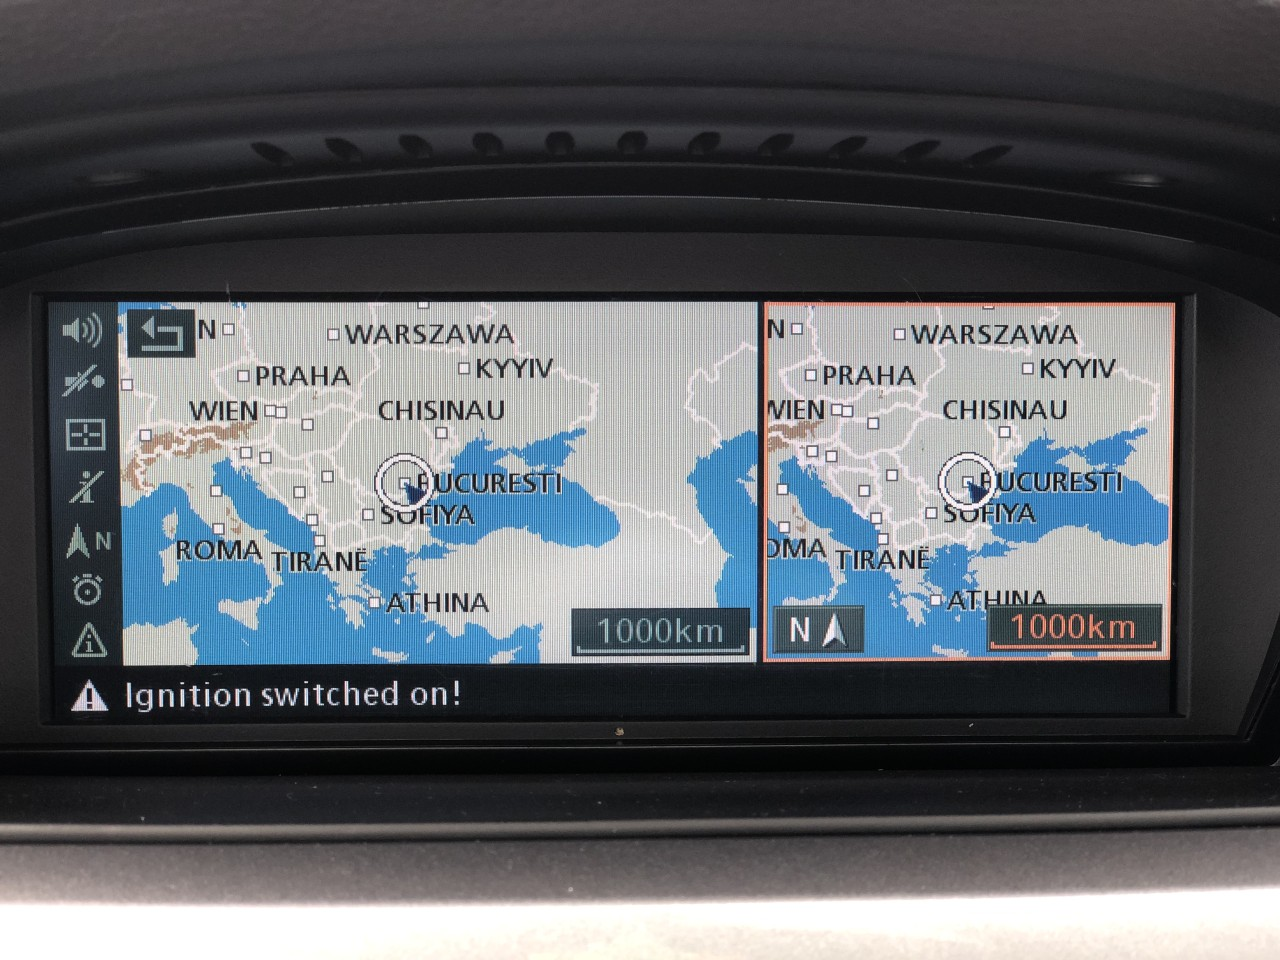 BMW 320 BMW 320D 177Cp Euro5 EXTRA -FULL/ M_Paket/Keyless-Go/Bi-XENON/Navi MARE/Trapa Panoramica/Scaune M/Pilot/Camera fazalunga-scurta/Bluetooth/Lumini ambientale/RECENT ADUSA DIN GERMANIA!!! 2009